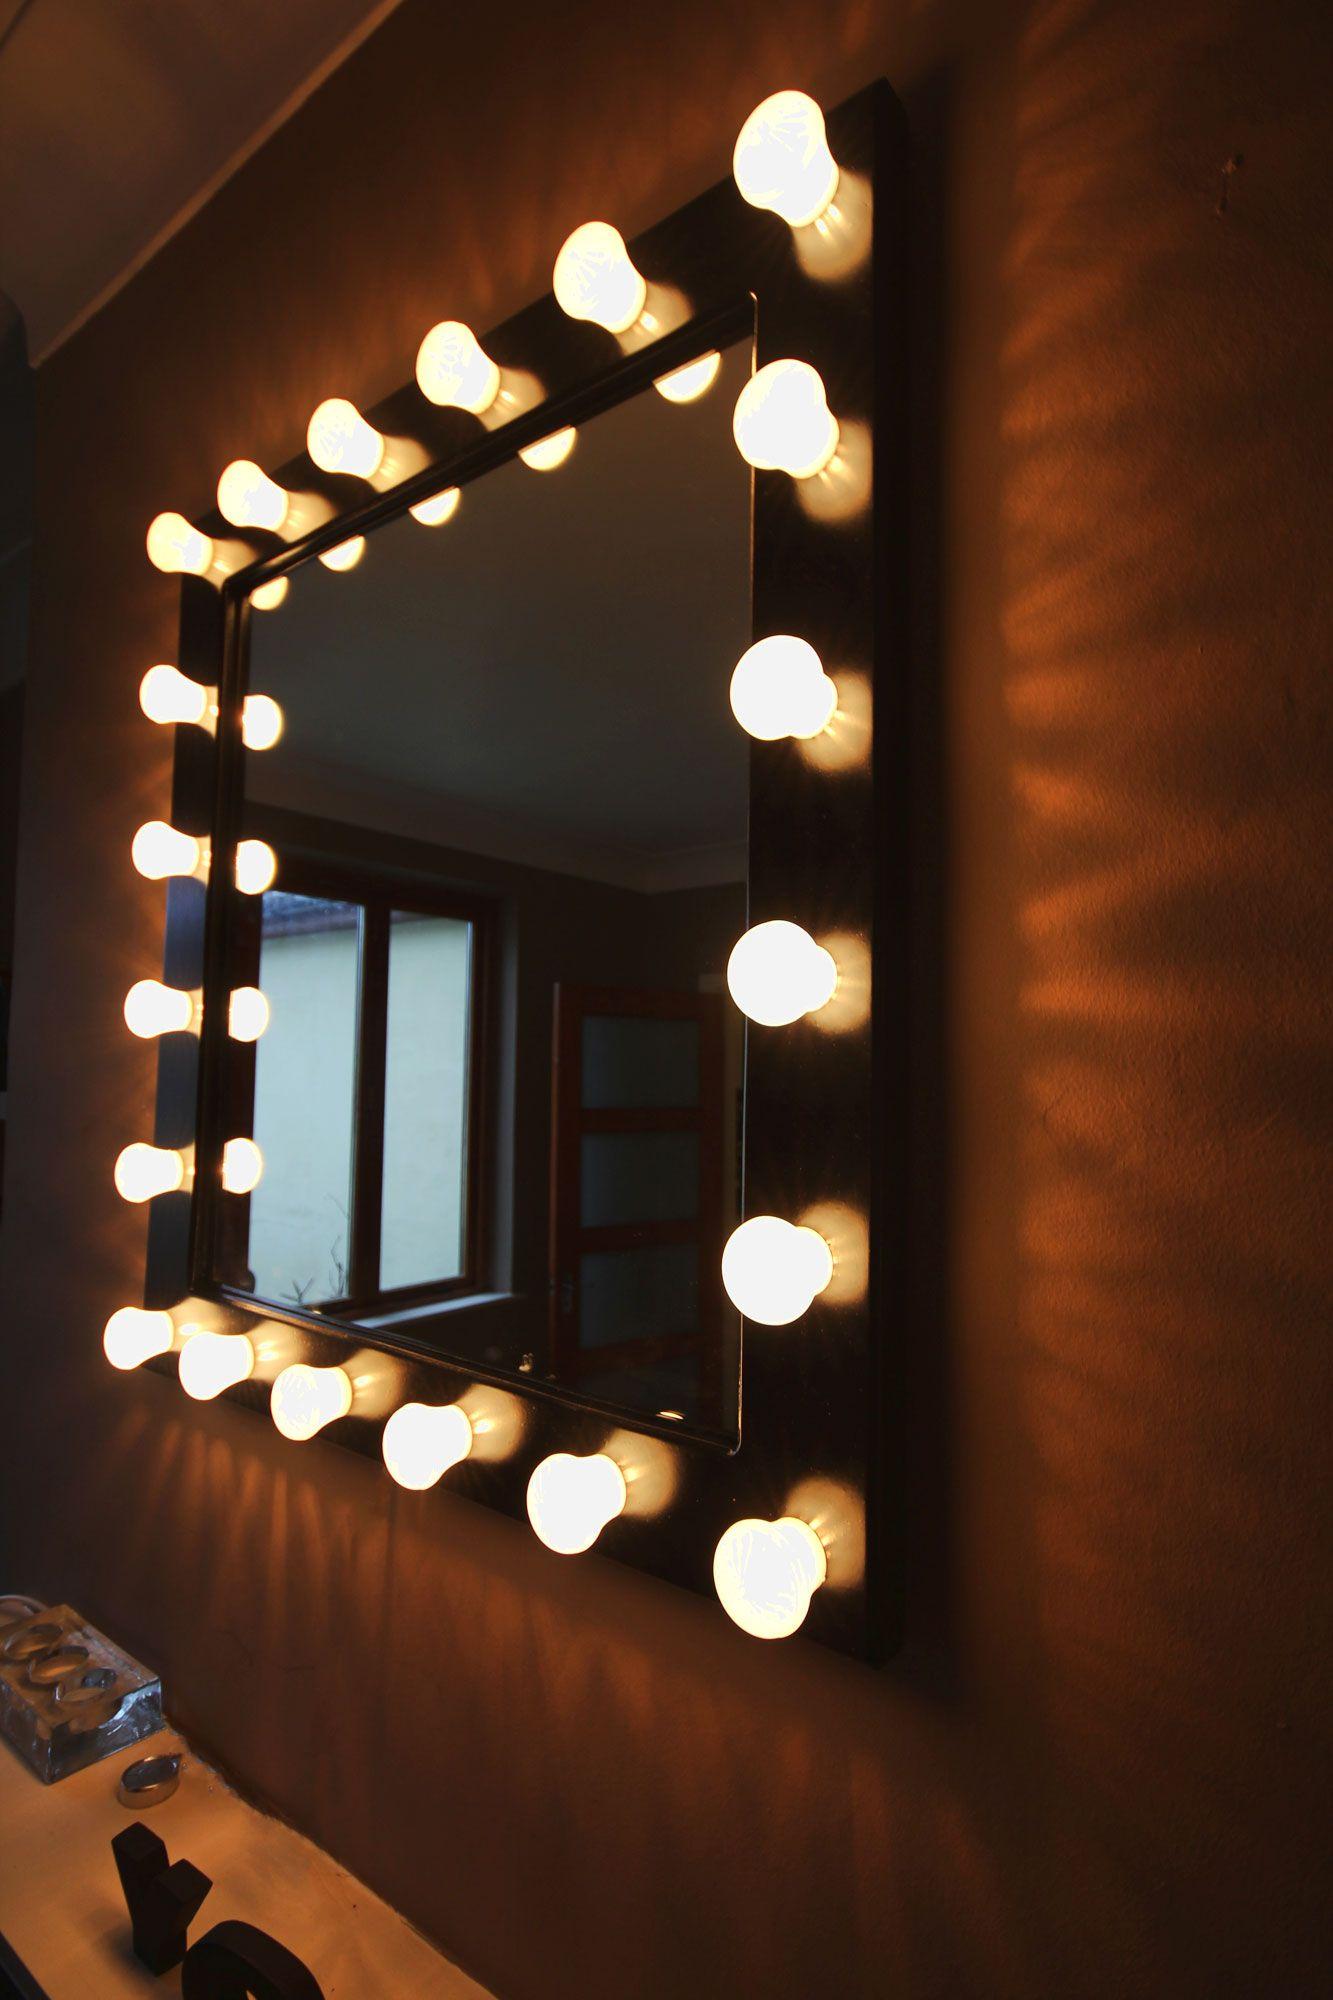 u0027Backstage Dressing Roomu0027 type Mirror. 27.5  high 25.5  wide. 20 & Backstage Dressing Roomu0027 type Mirror. 27.5